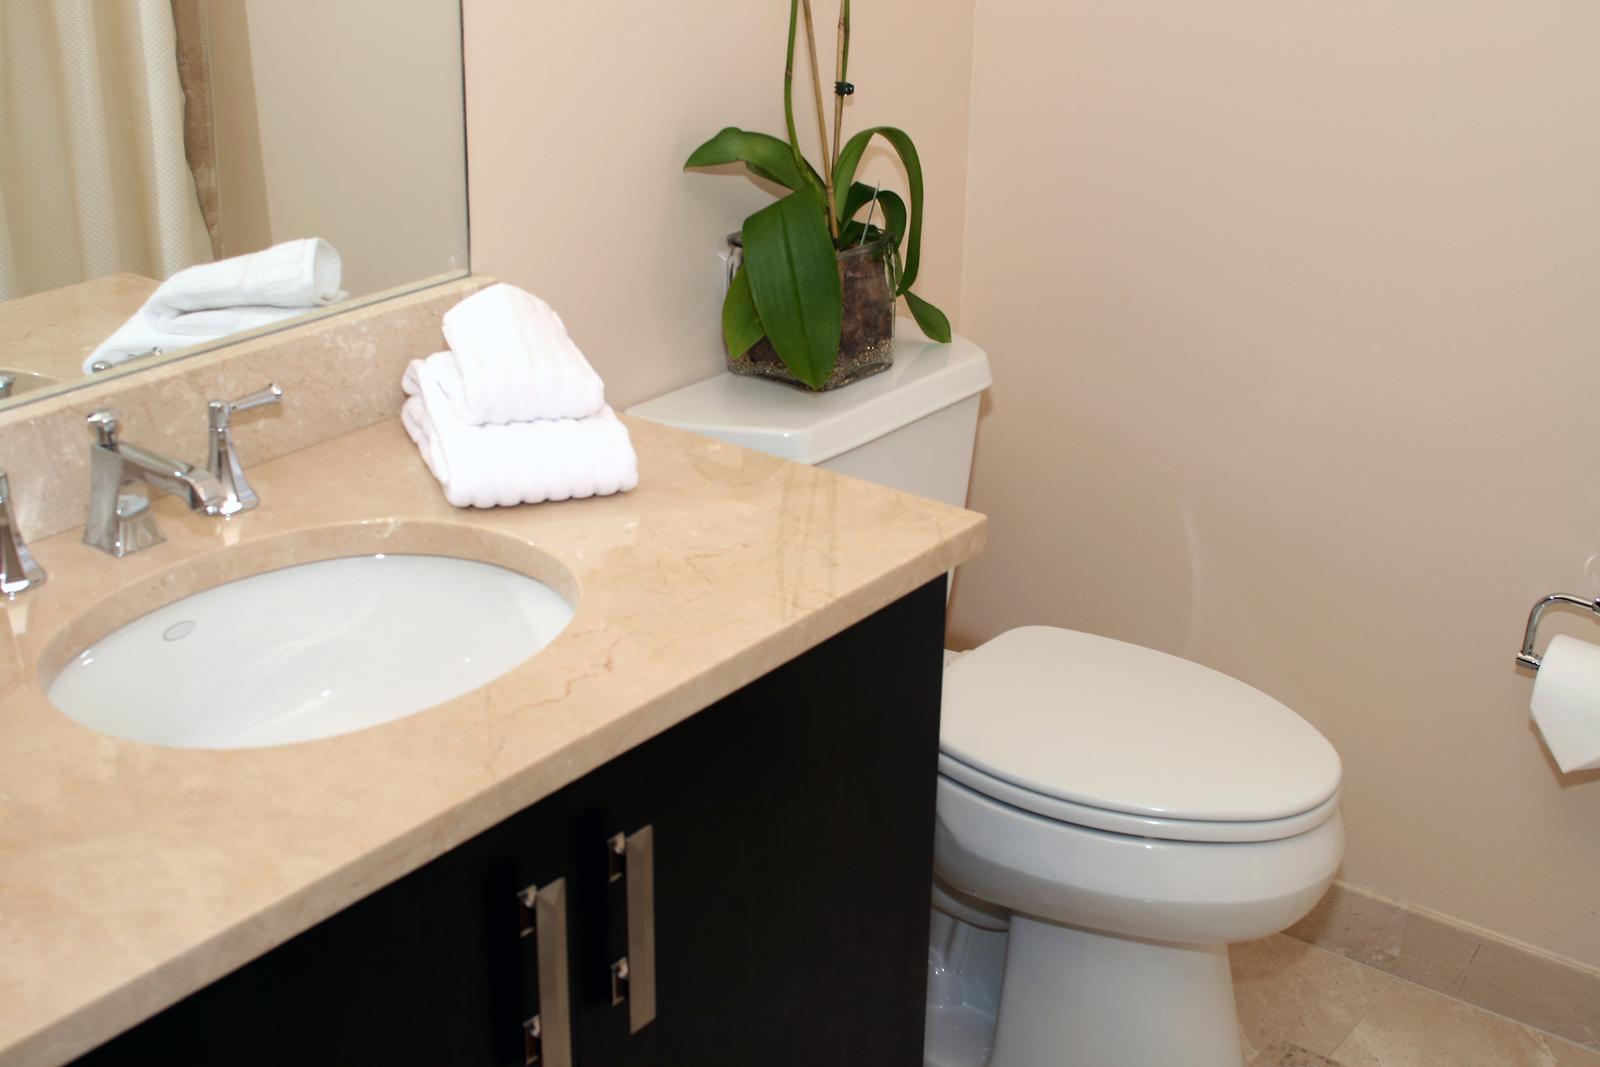 Denver Remodeling | Bathroom Ideas - Consider These 6 Bathroom ...